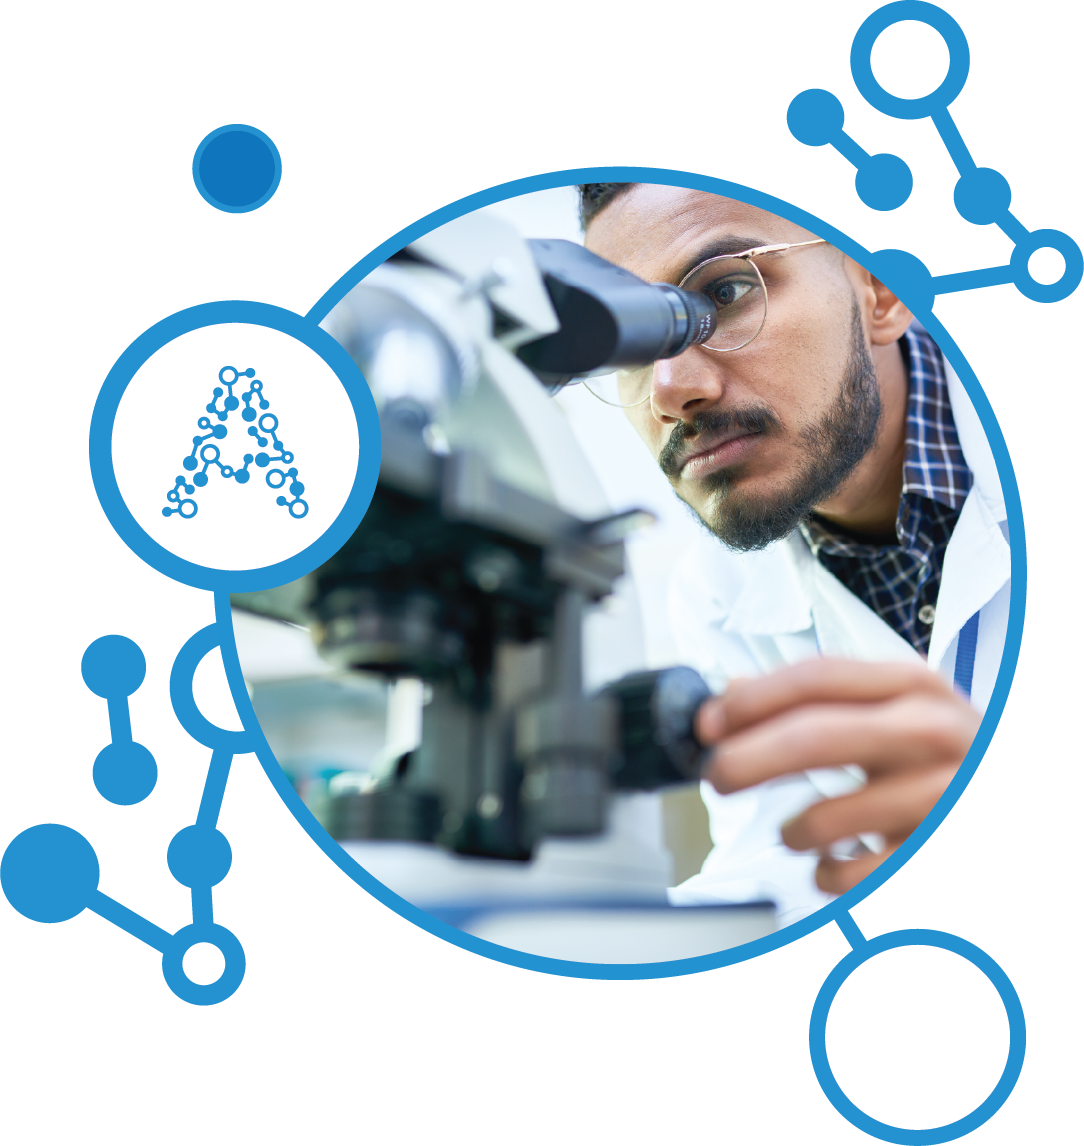 test solutions at apollo laboratories